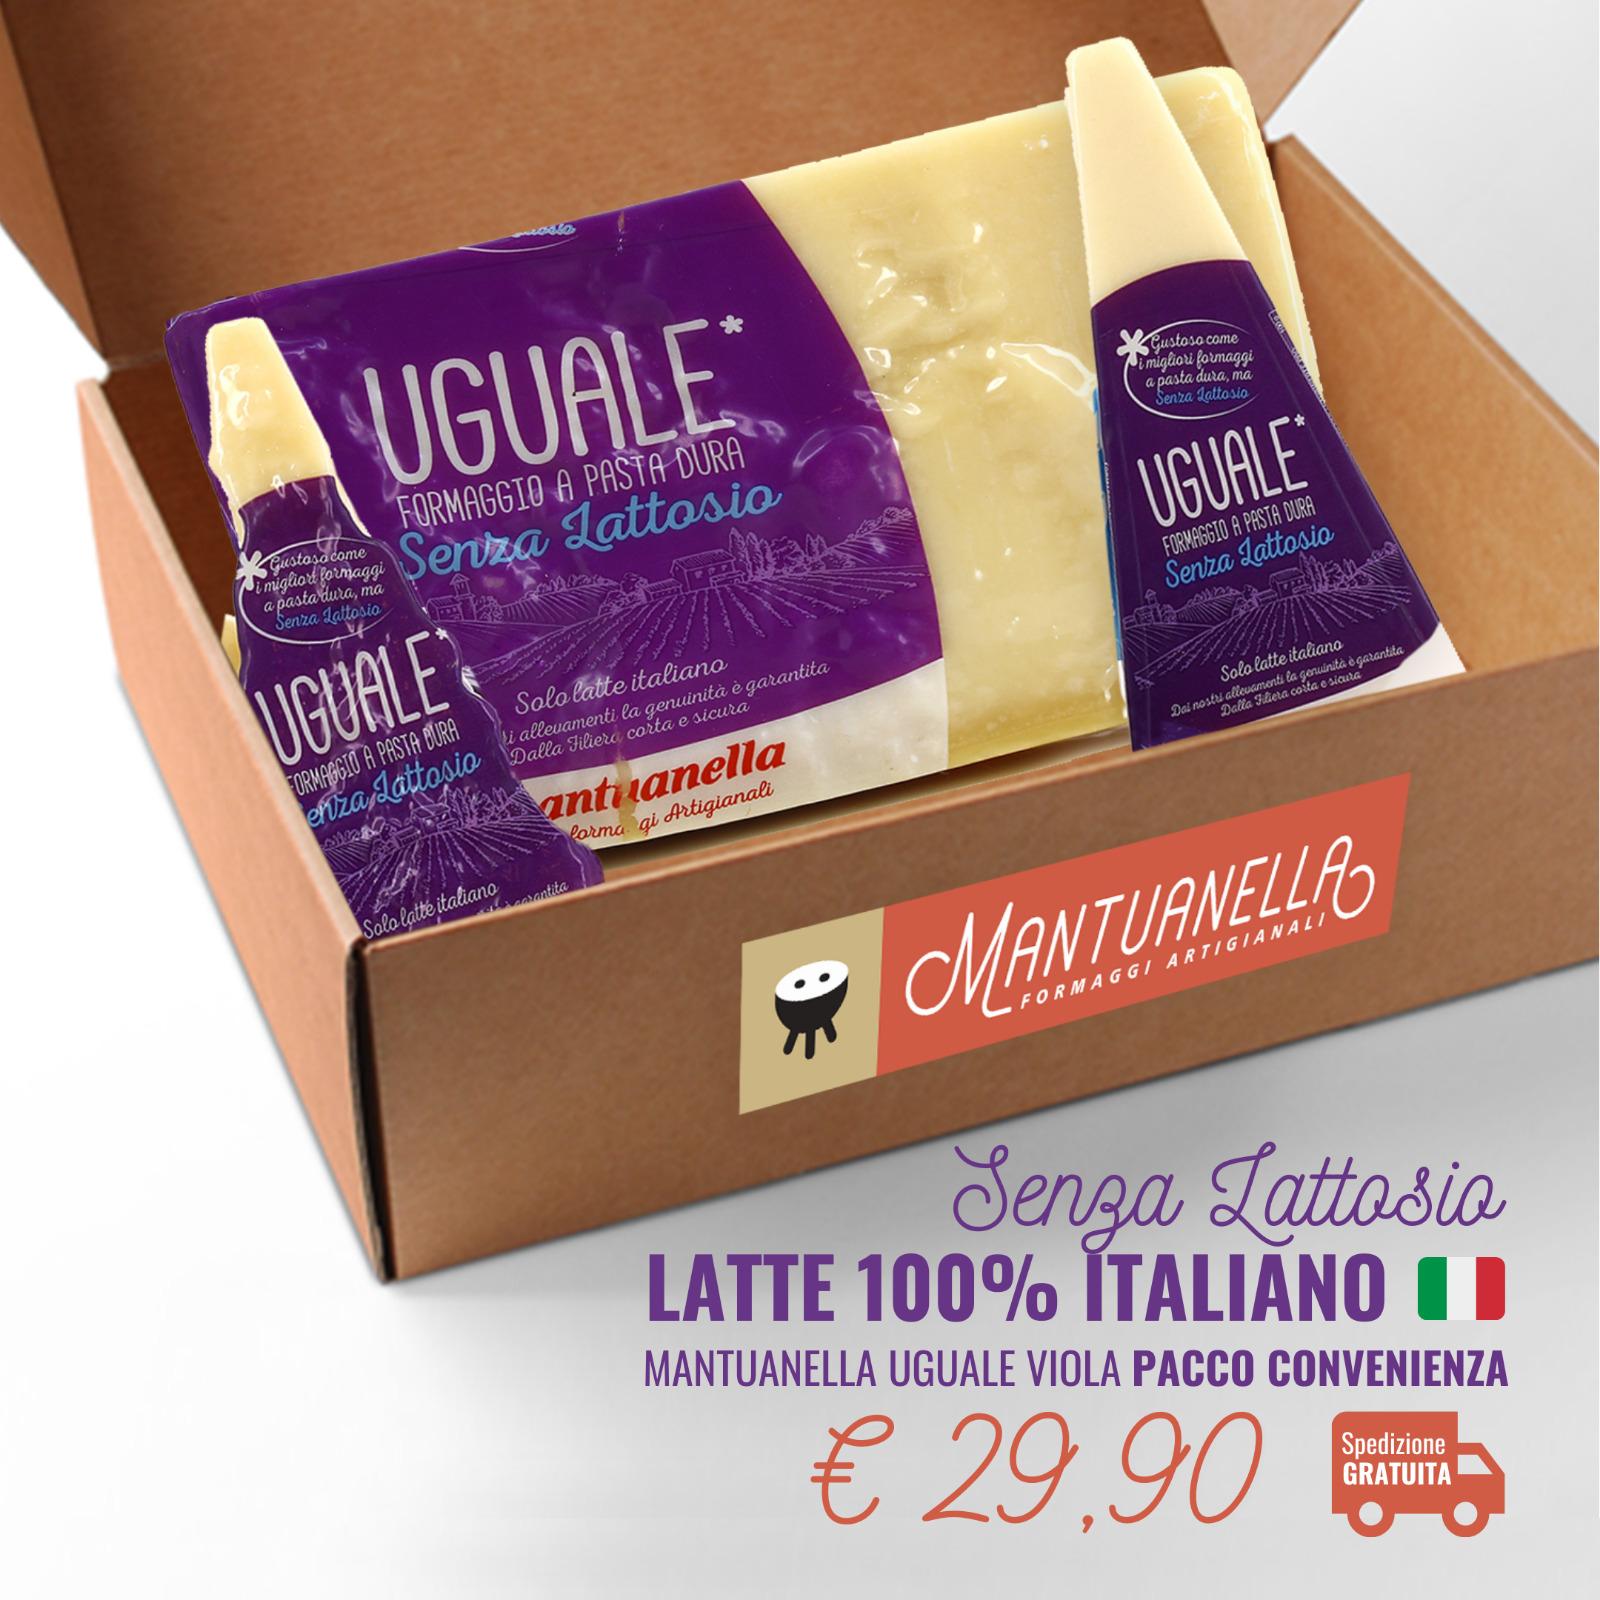 Pacco Convenienza Mantuanella Uguale Viola kg. 1.8